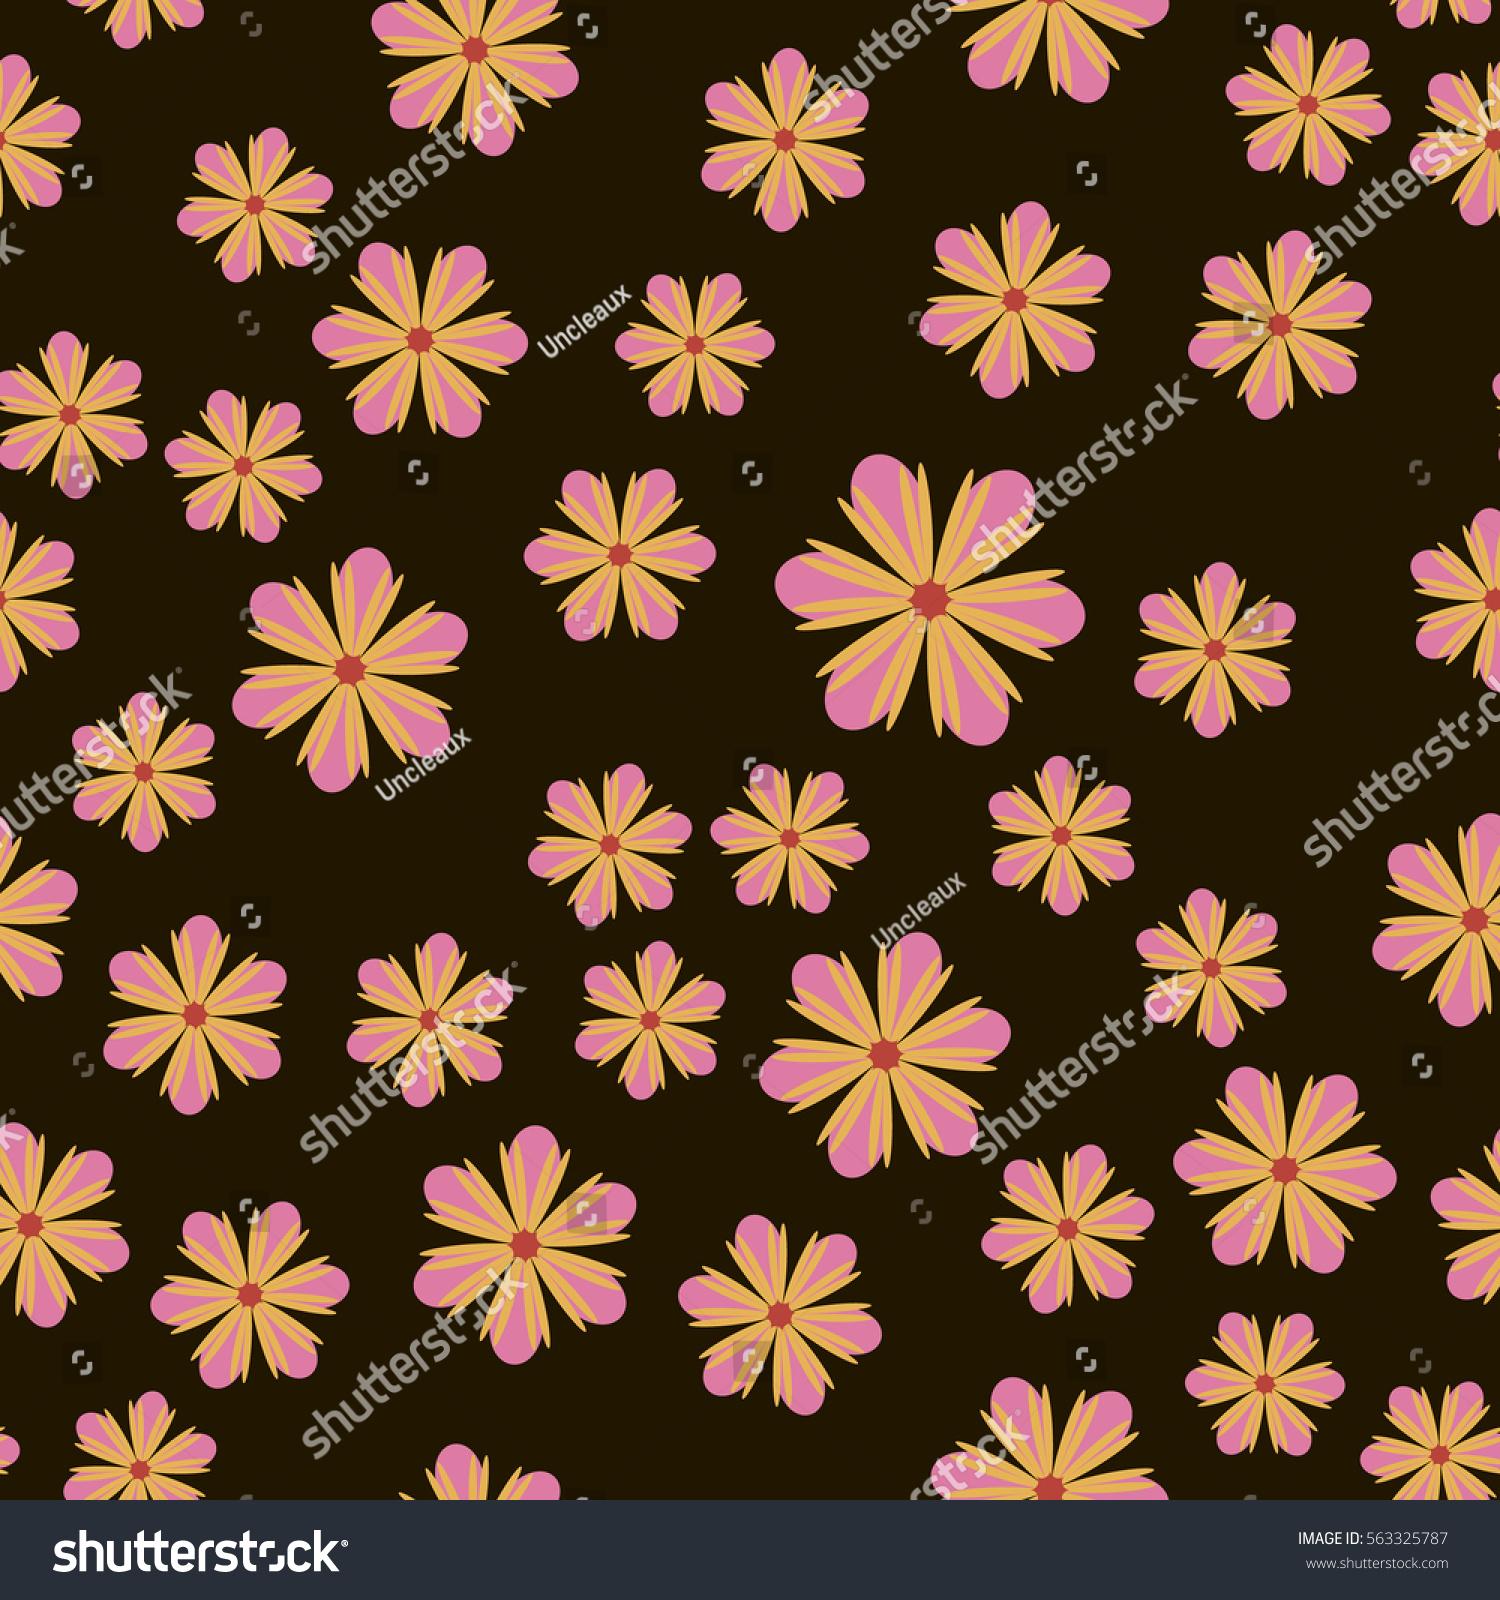 Exquisite Floral Ornament Random Flowers Fabric Stock Vector